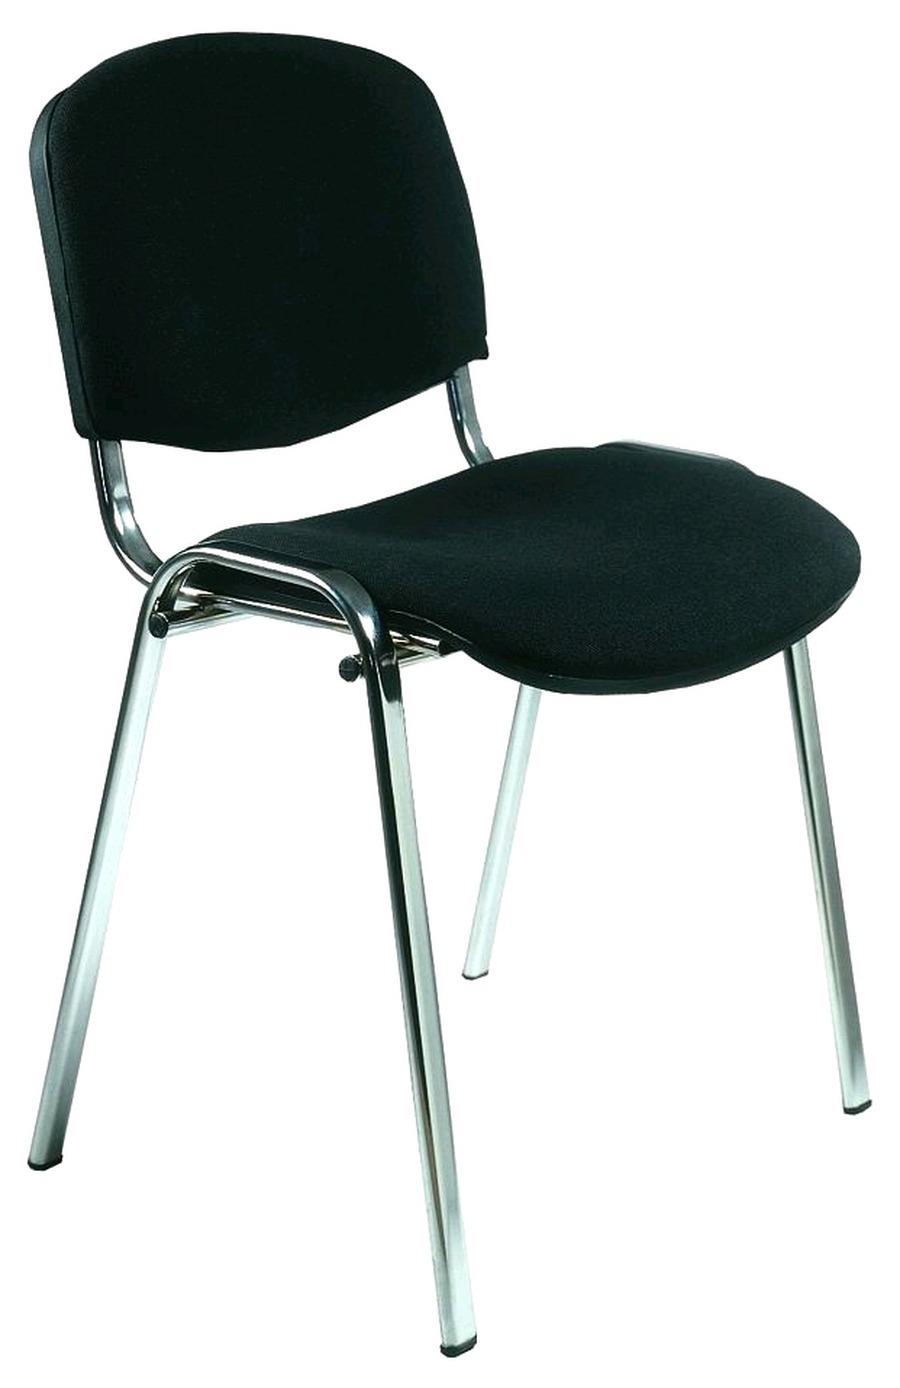 Офисный стул Виси хромКабинет<br><br><br>Длина мм: 800<br>Высота мм: 550<br>Глубина мм: 475